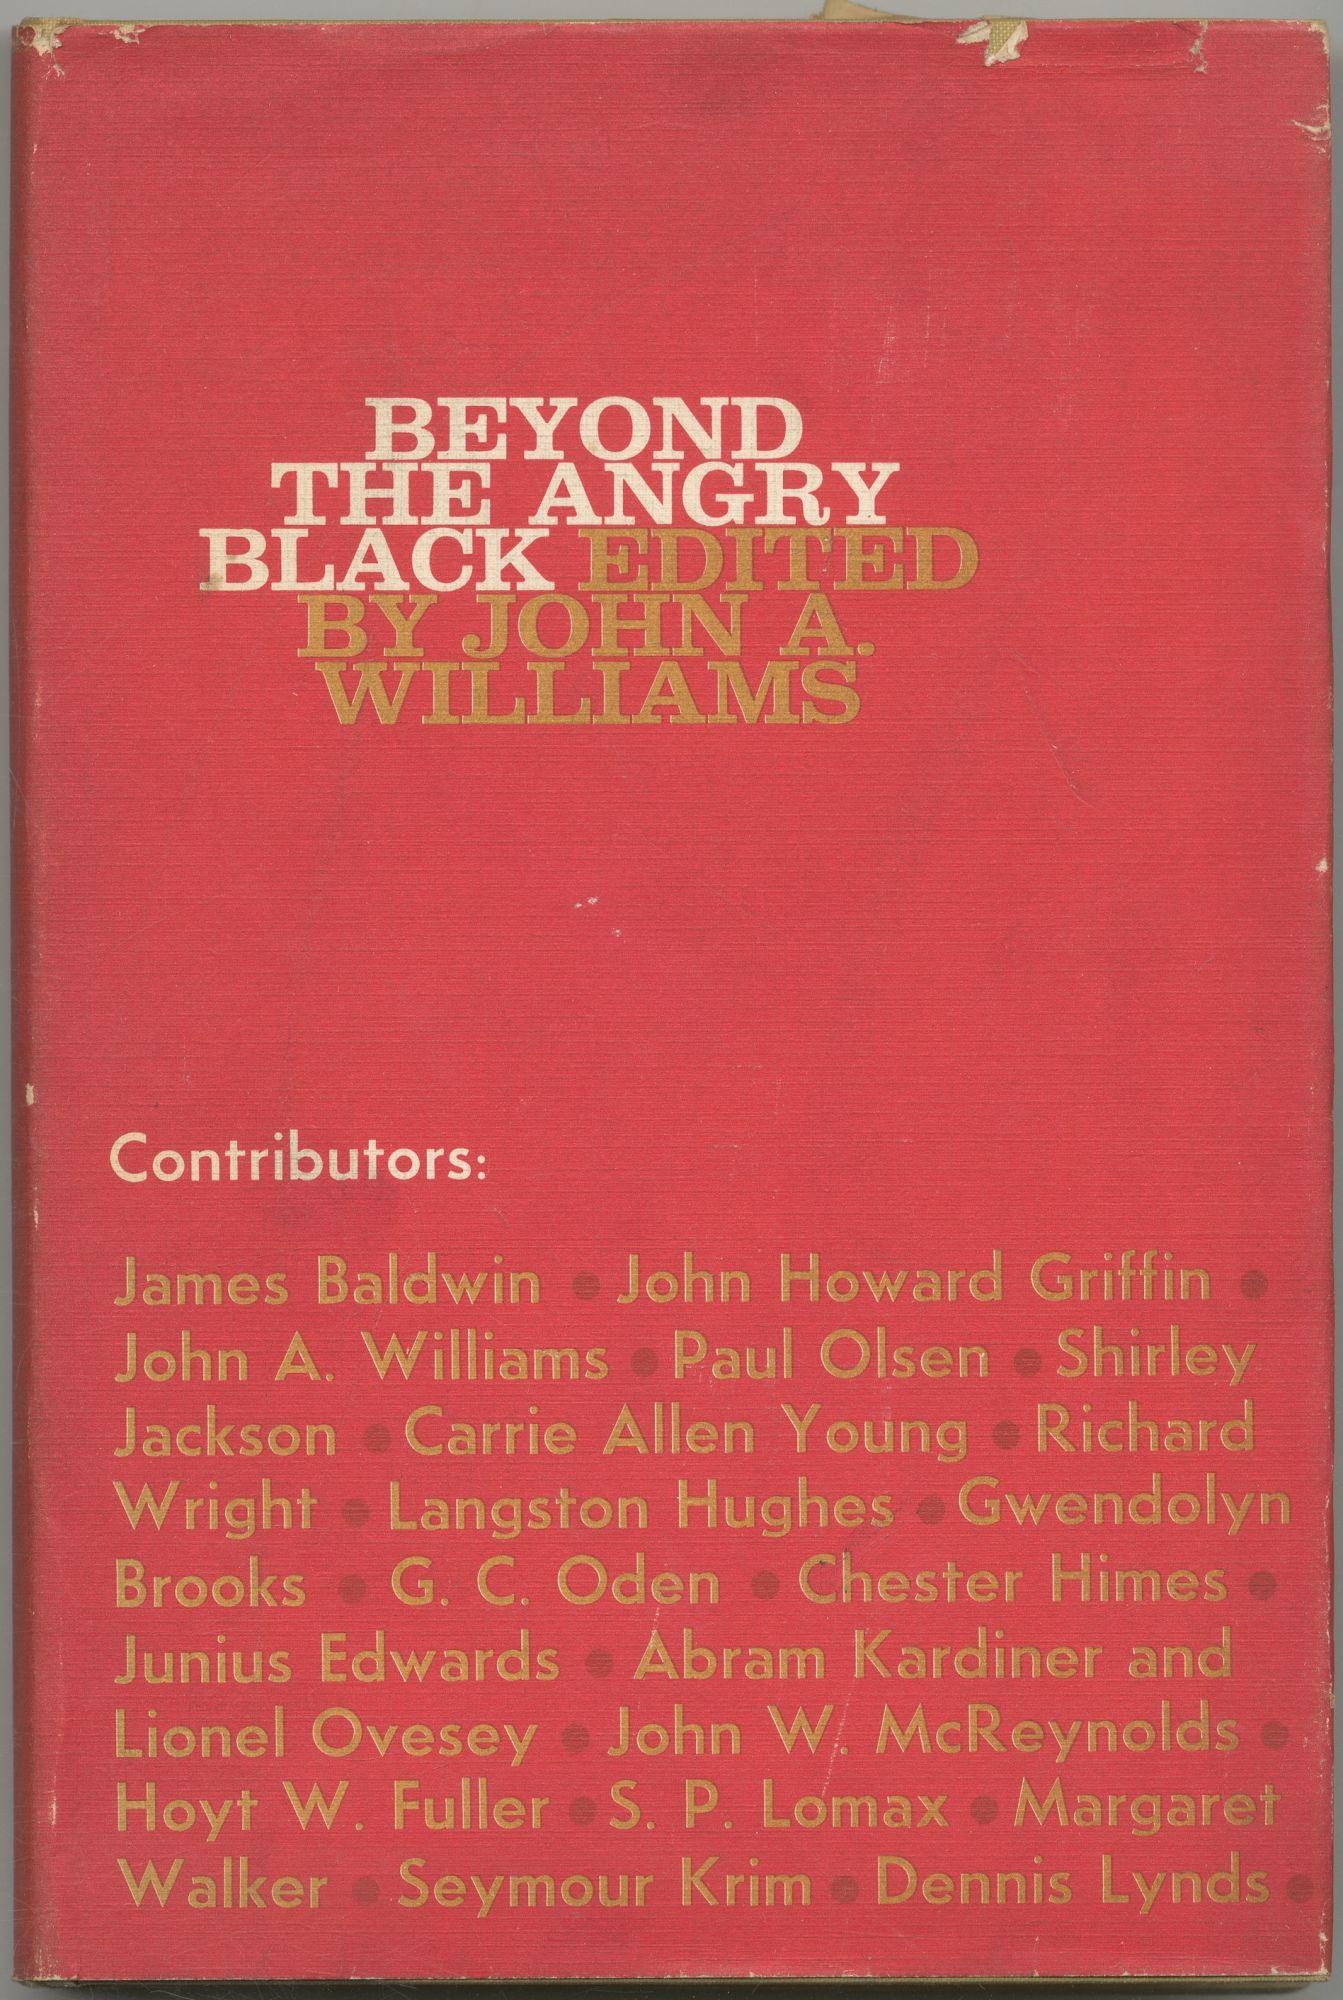 Beyond the Angry Black